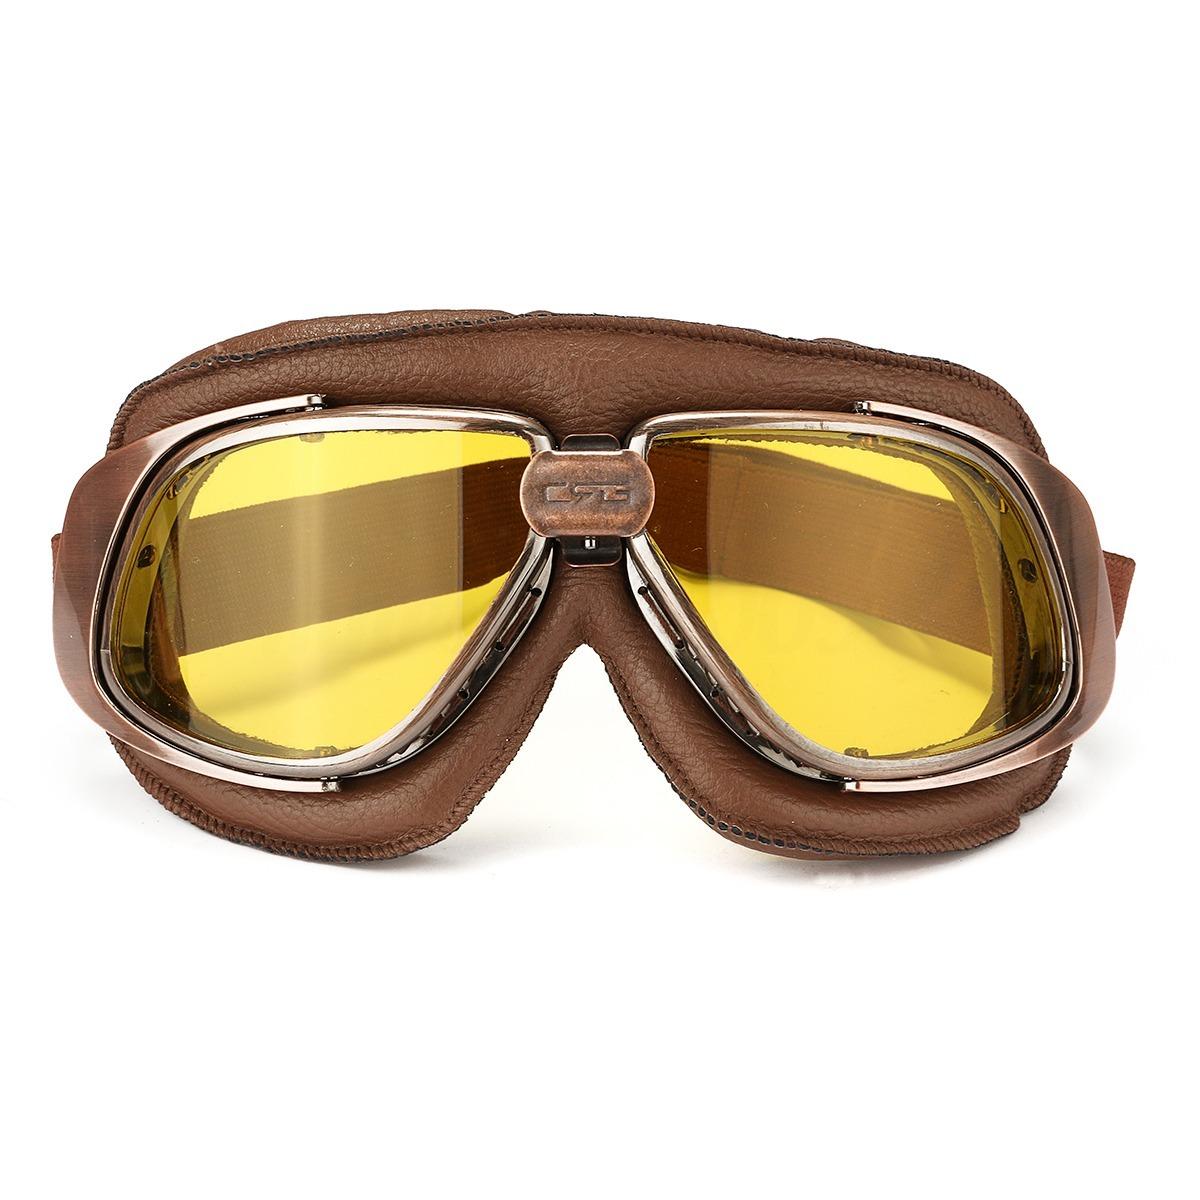 Oculos Moto Vintage Custom Old Café Bronze D Amarelo - R  115,00 em ... 8520751ea8